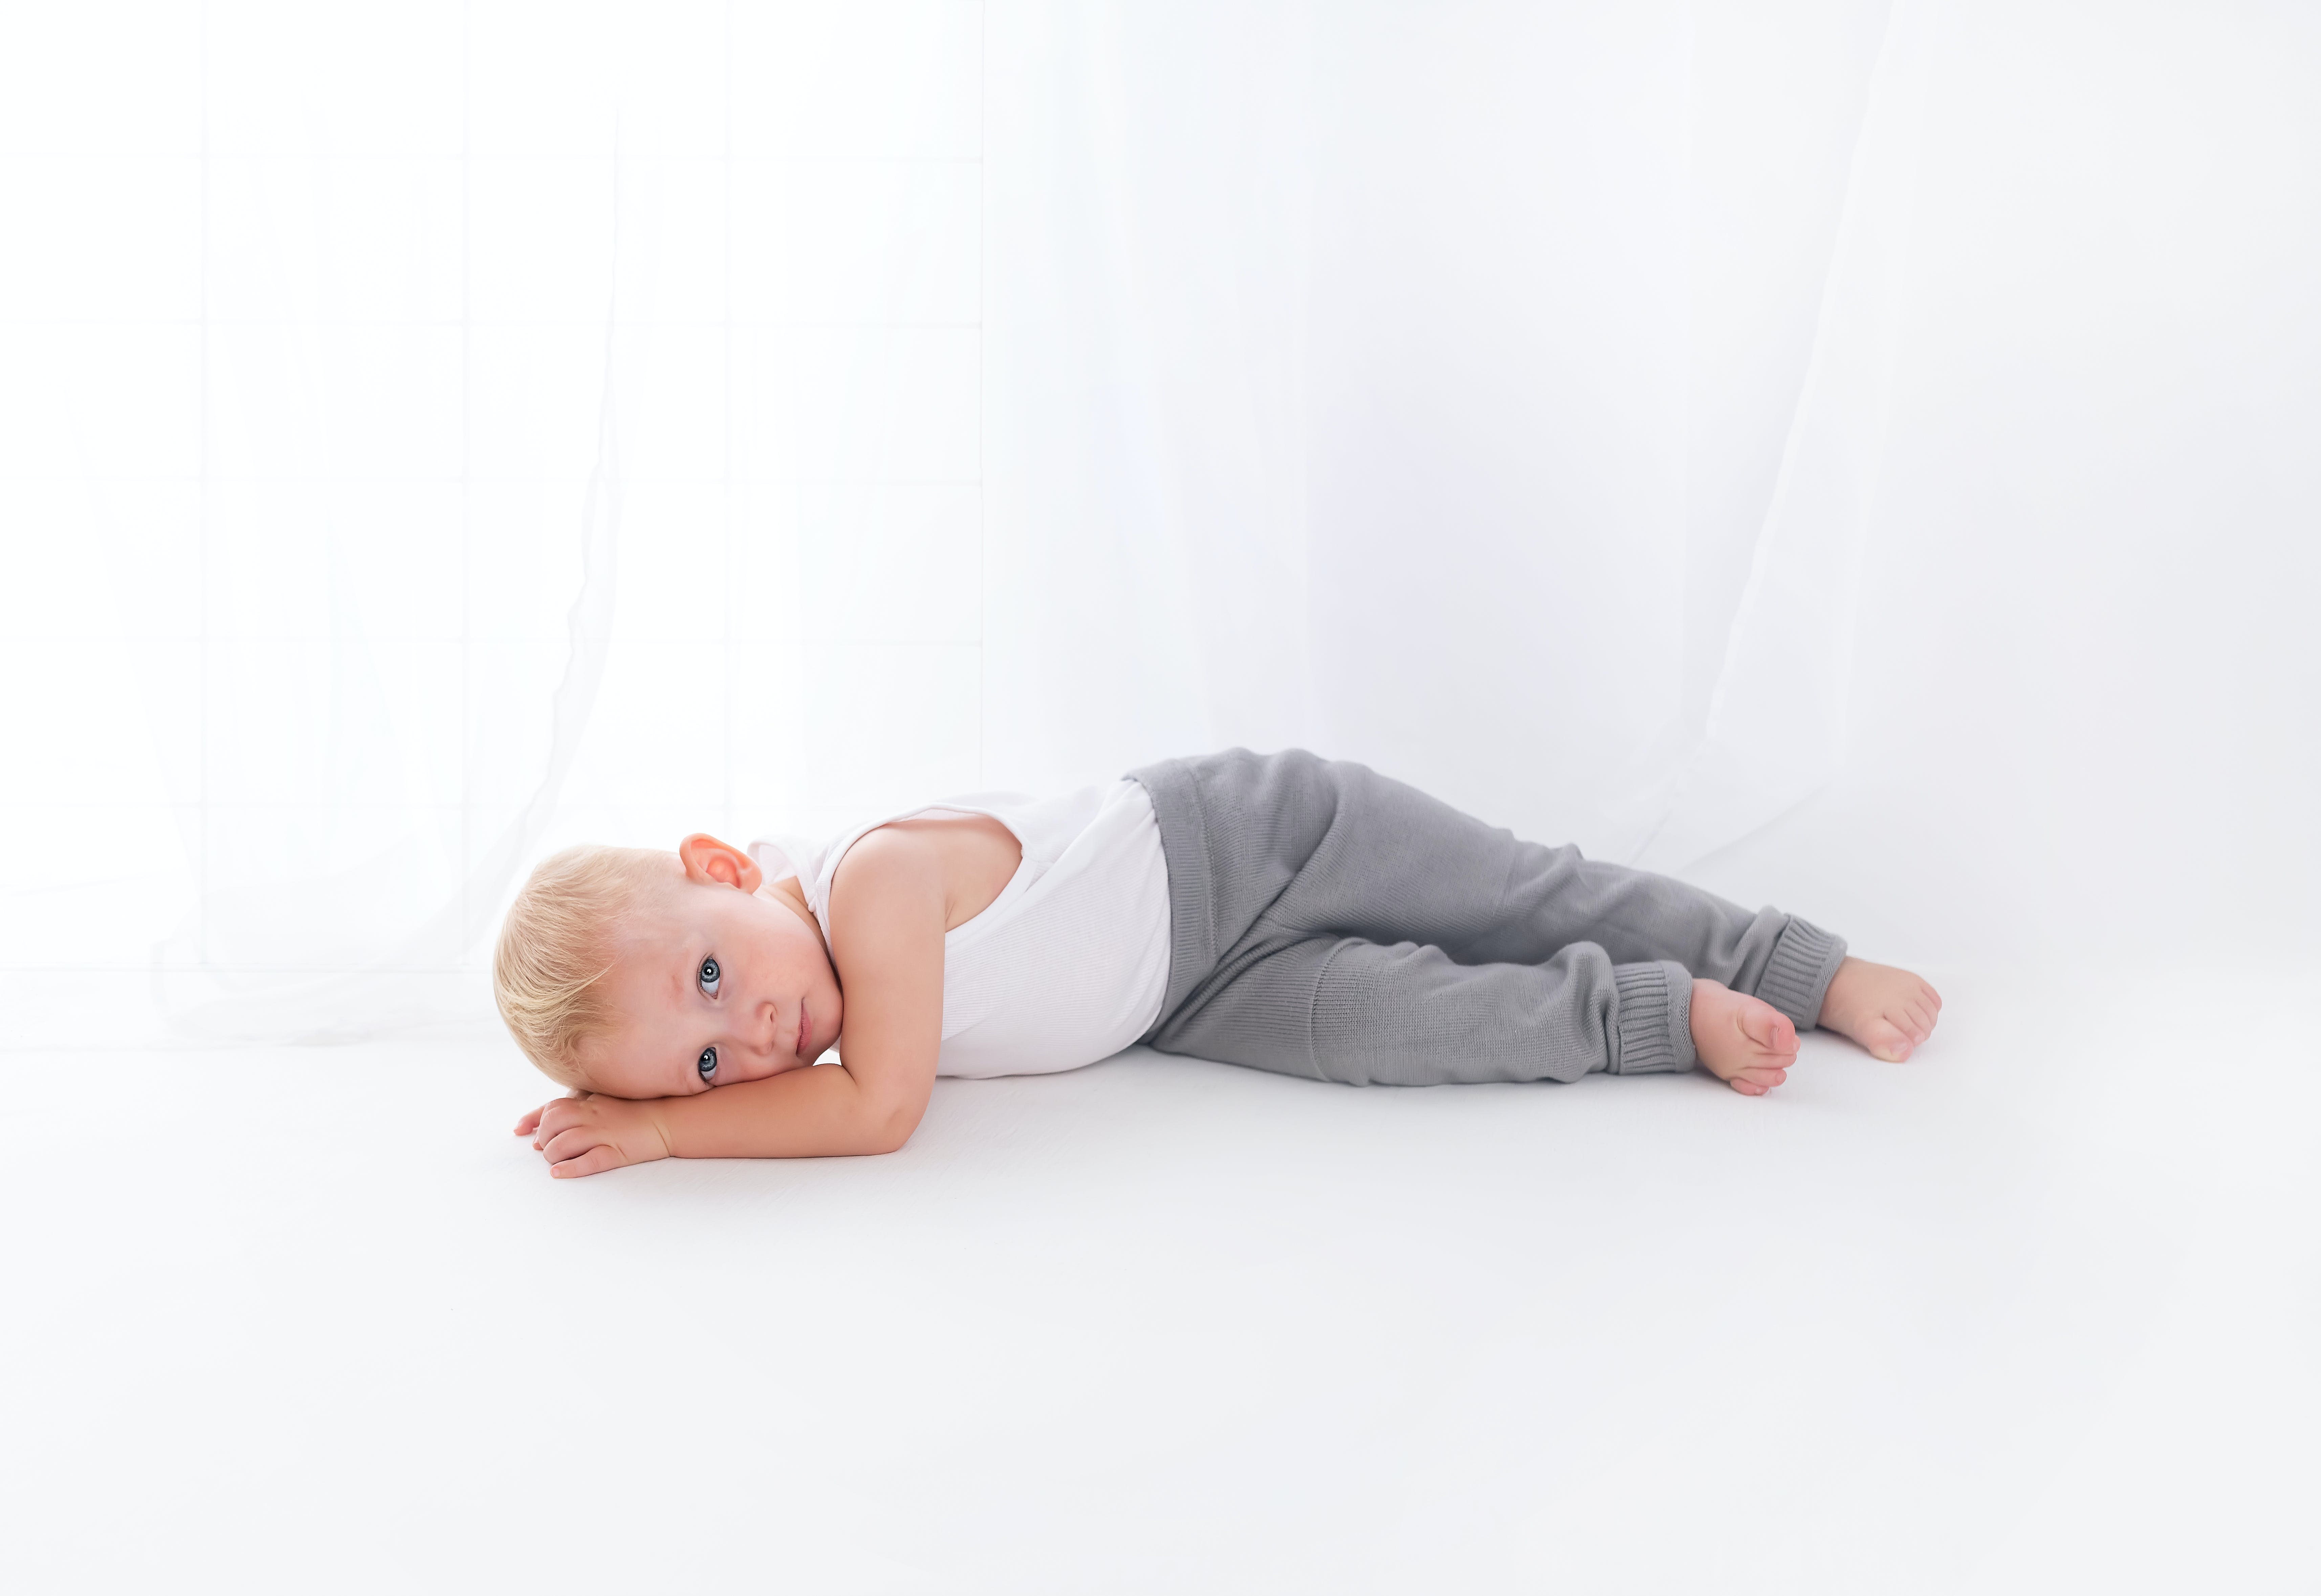 Kostenloses Stock Foto zu baby, bezaubernd, fotoshooting, gucken